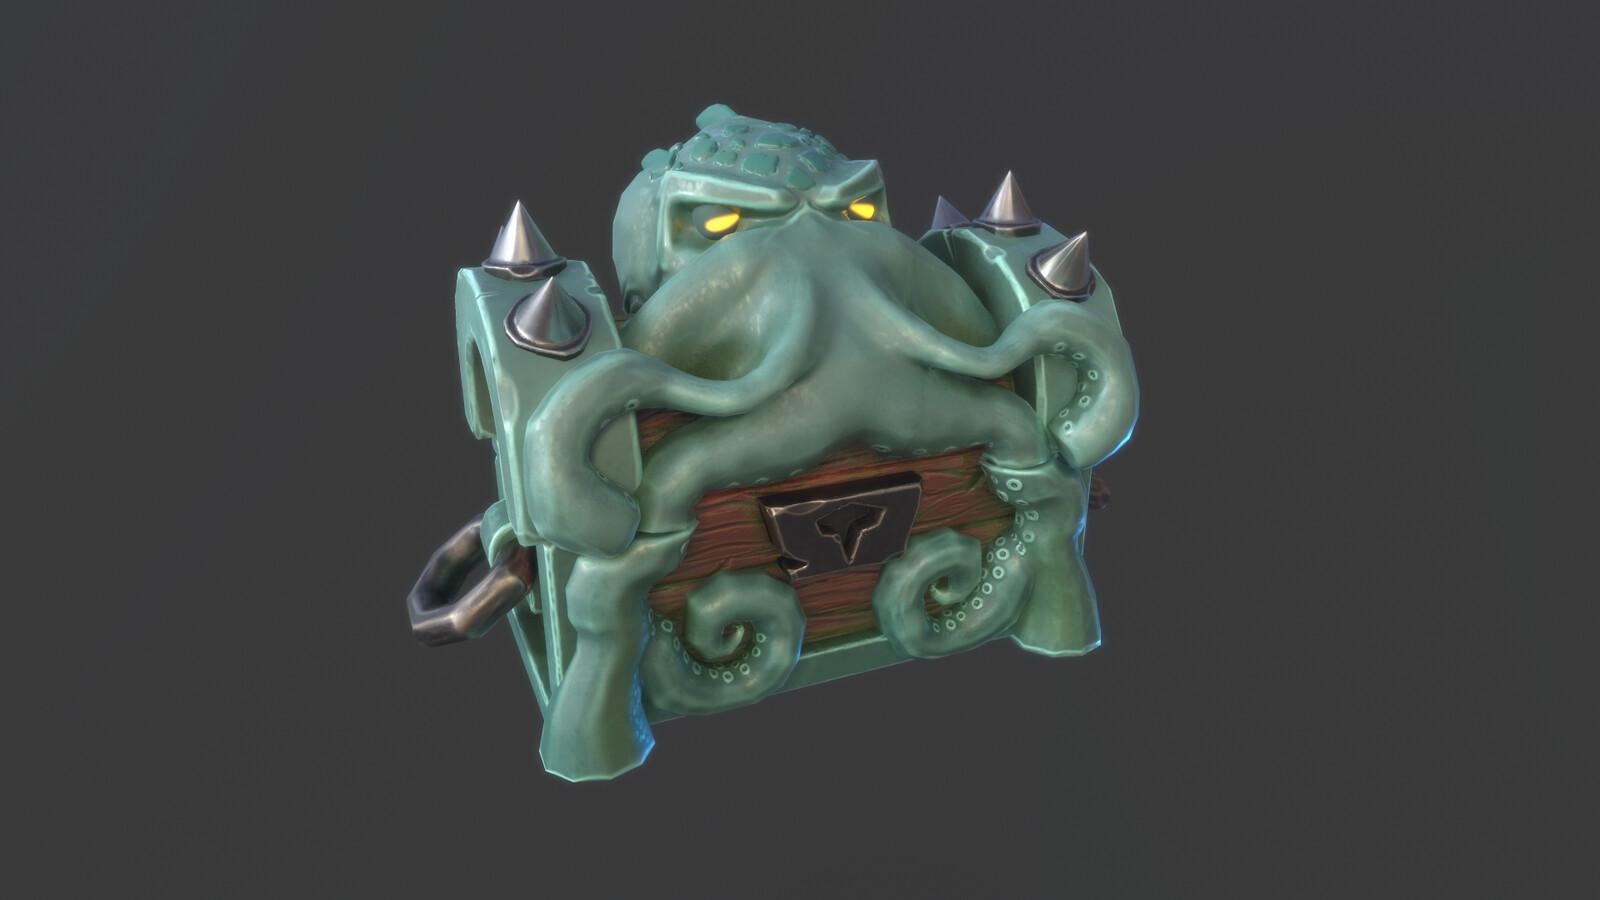 Stylized Octobox Chest